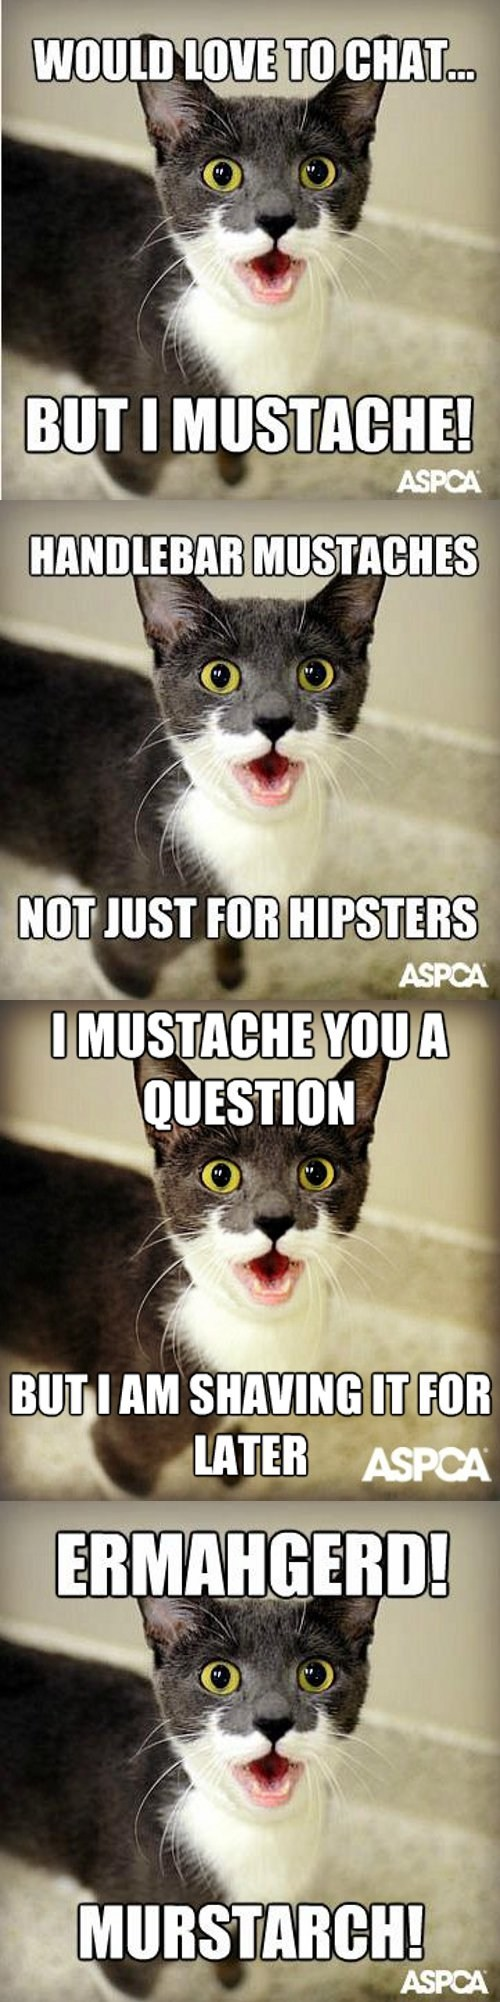 mustache,meme,nory,Cats